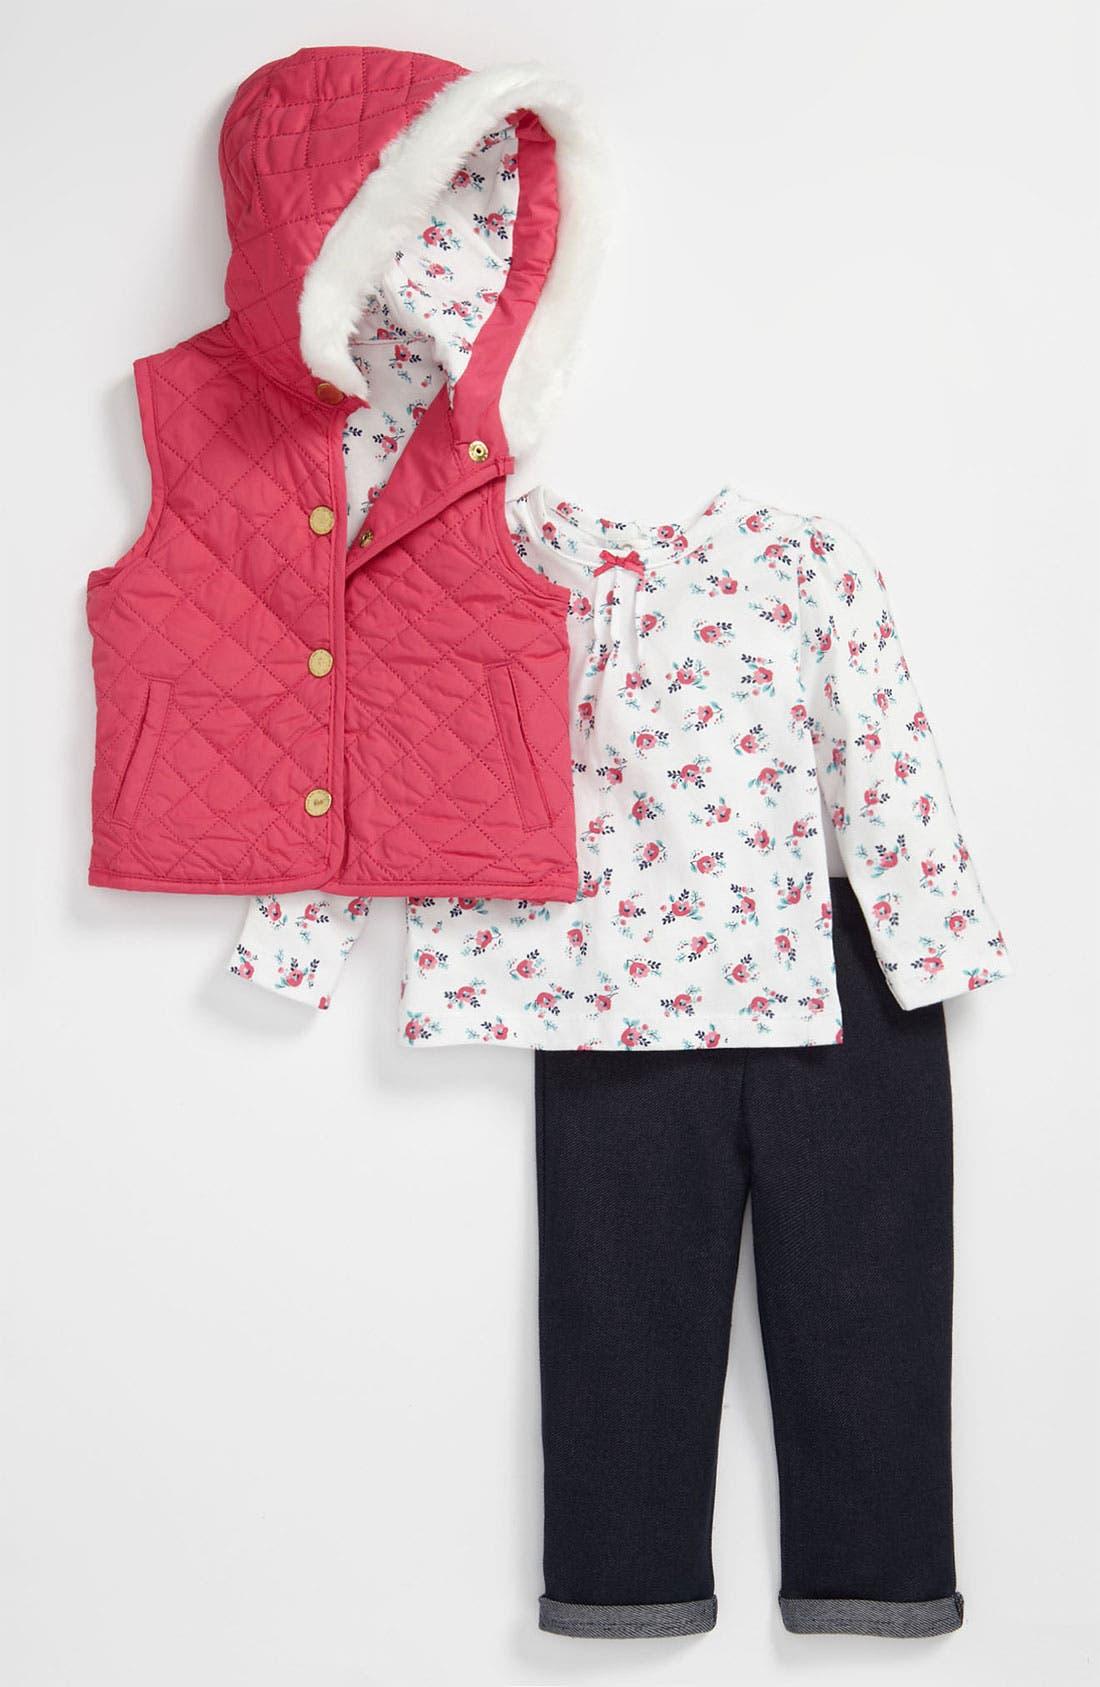 Main Image - Little Me 'Magenta' Top, Leggings & Vest (Infant)